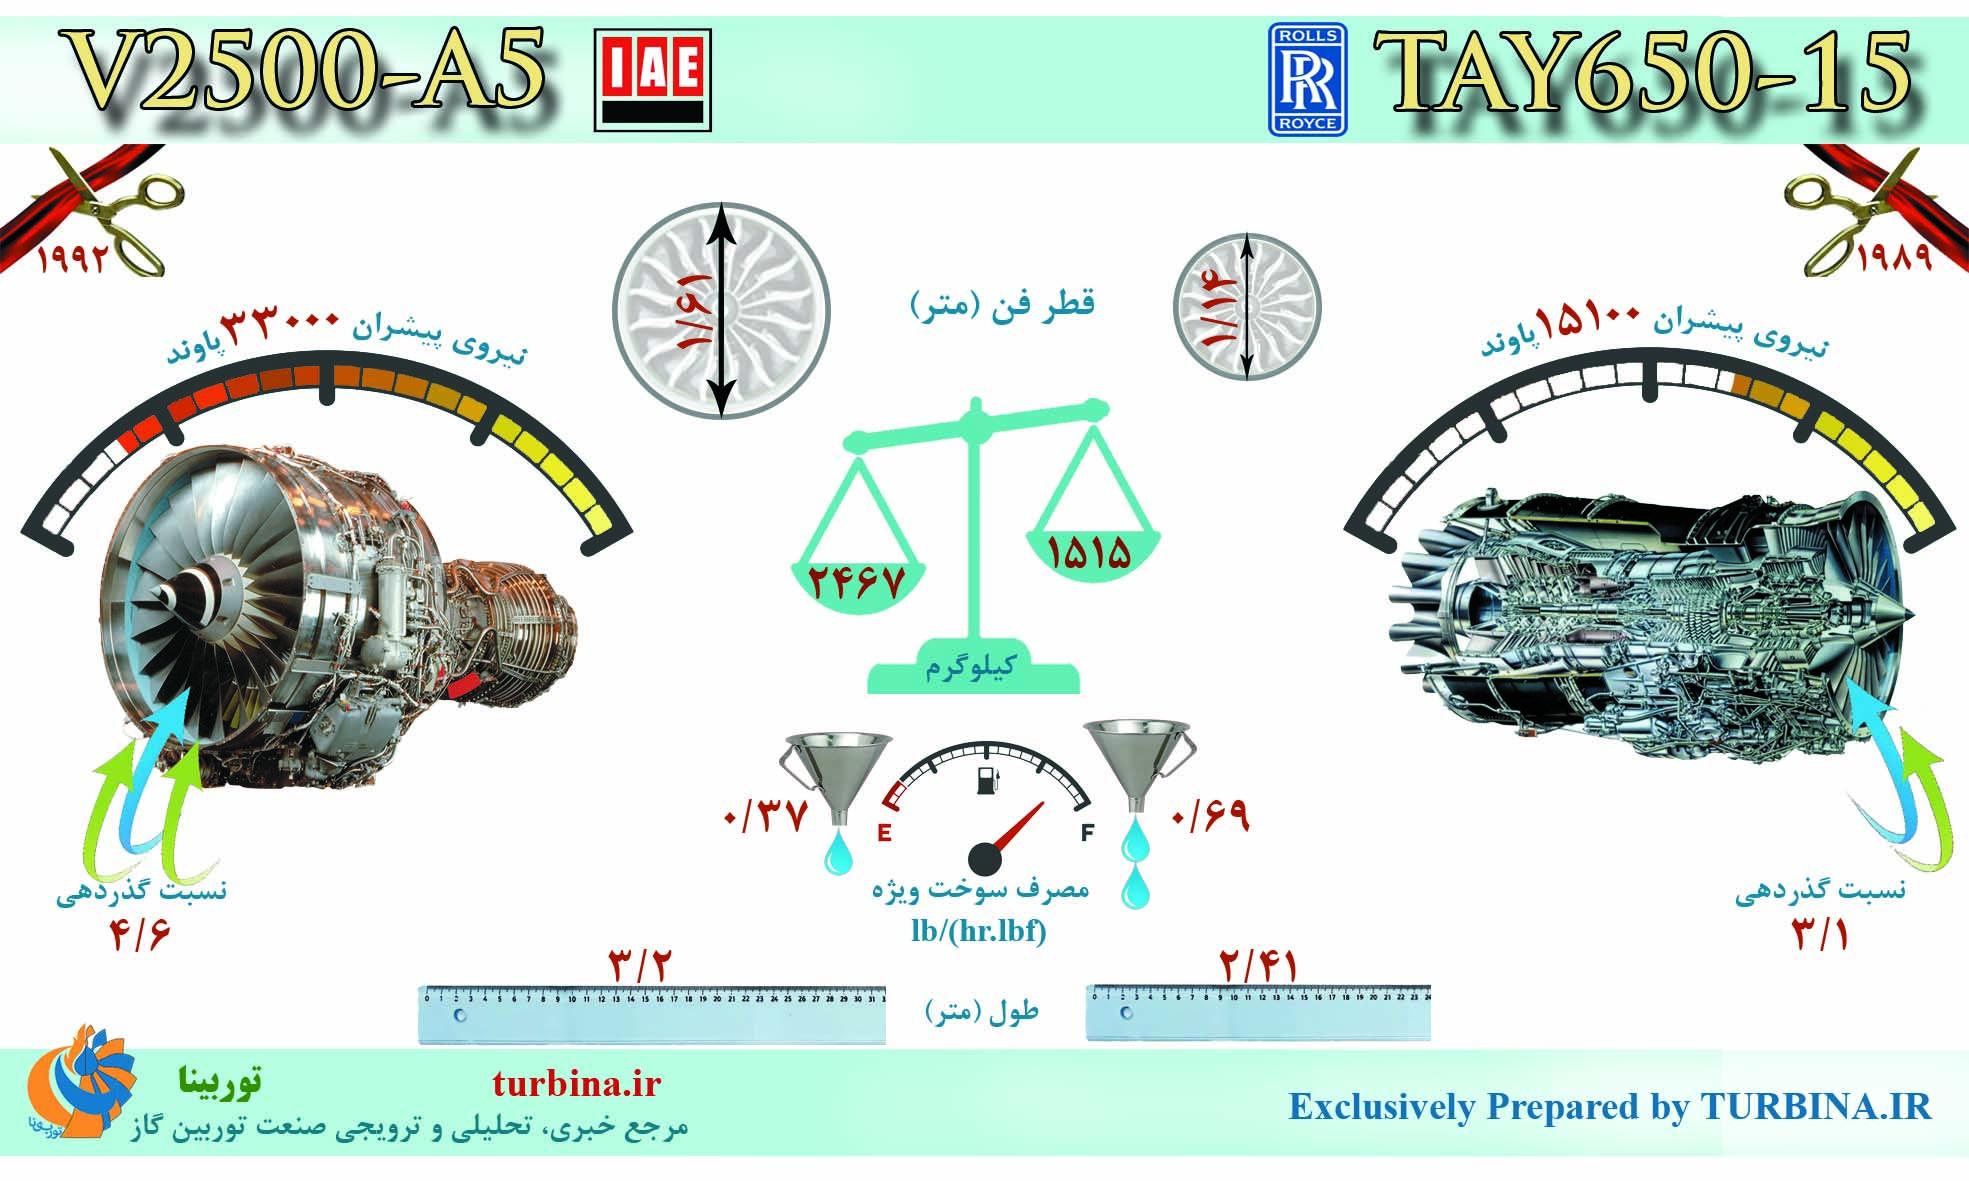 مقایسه موتورهای V2500-A5 و TAY650-15